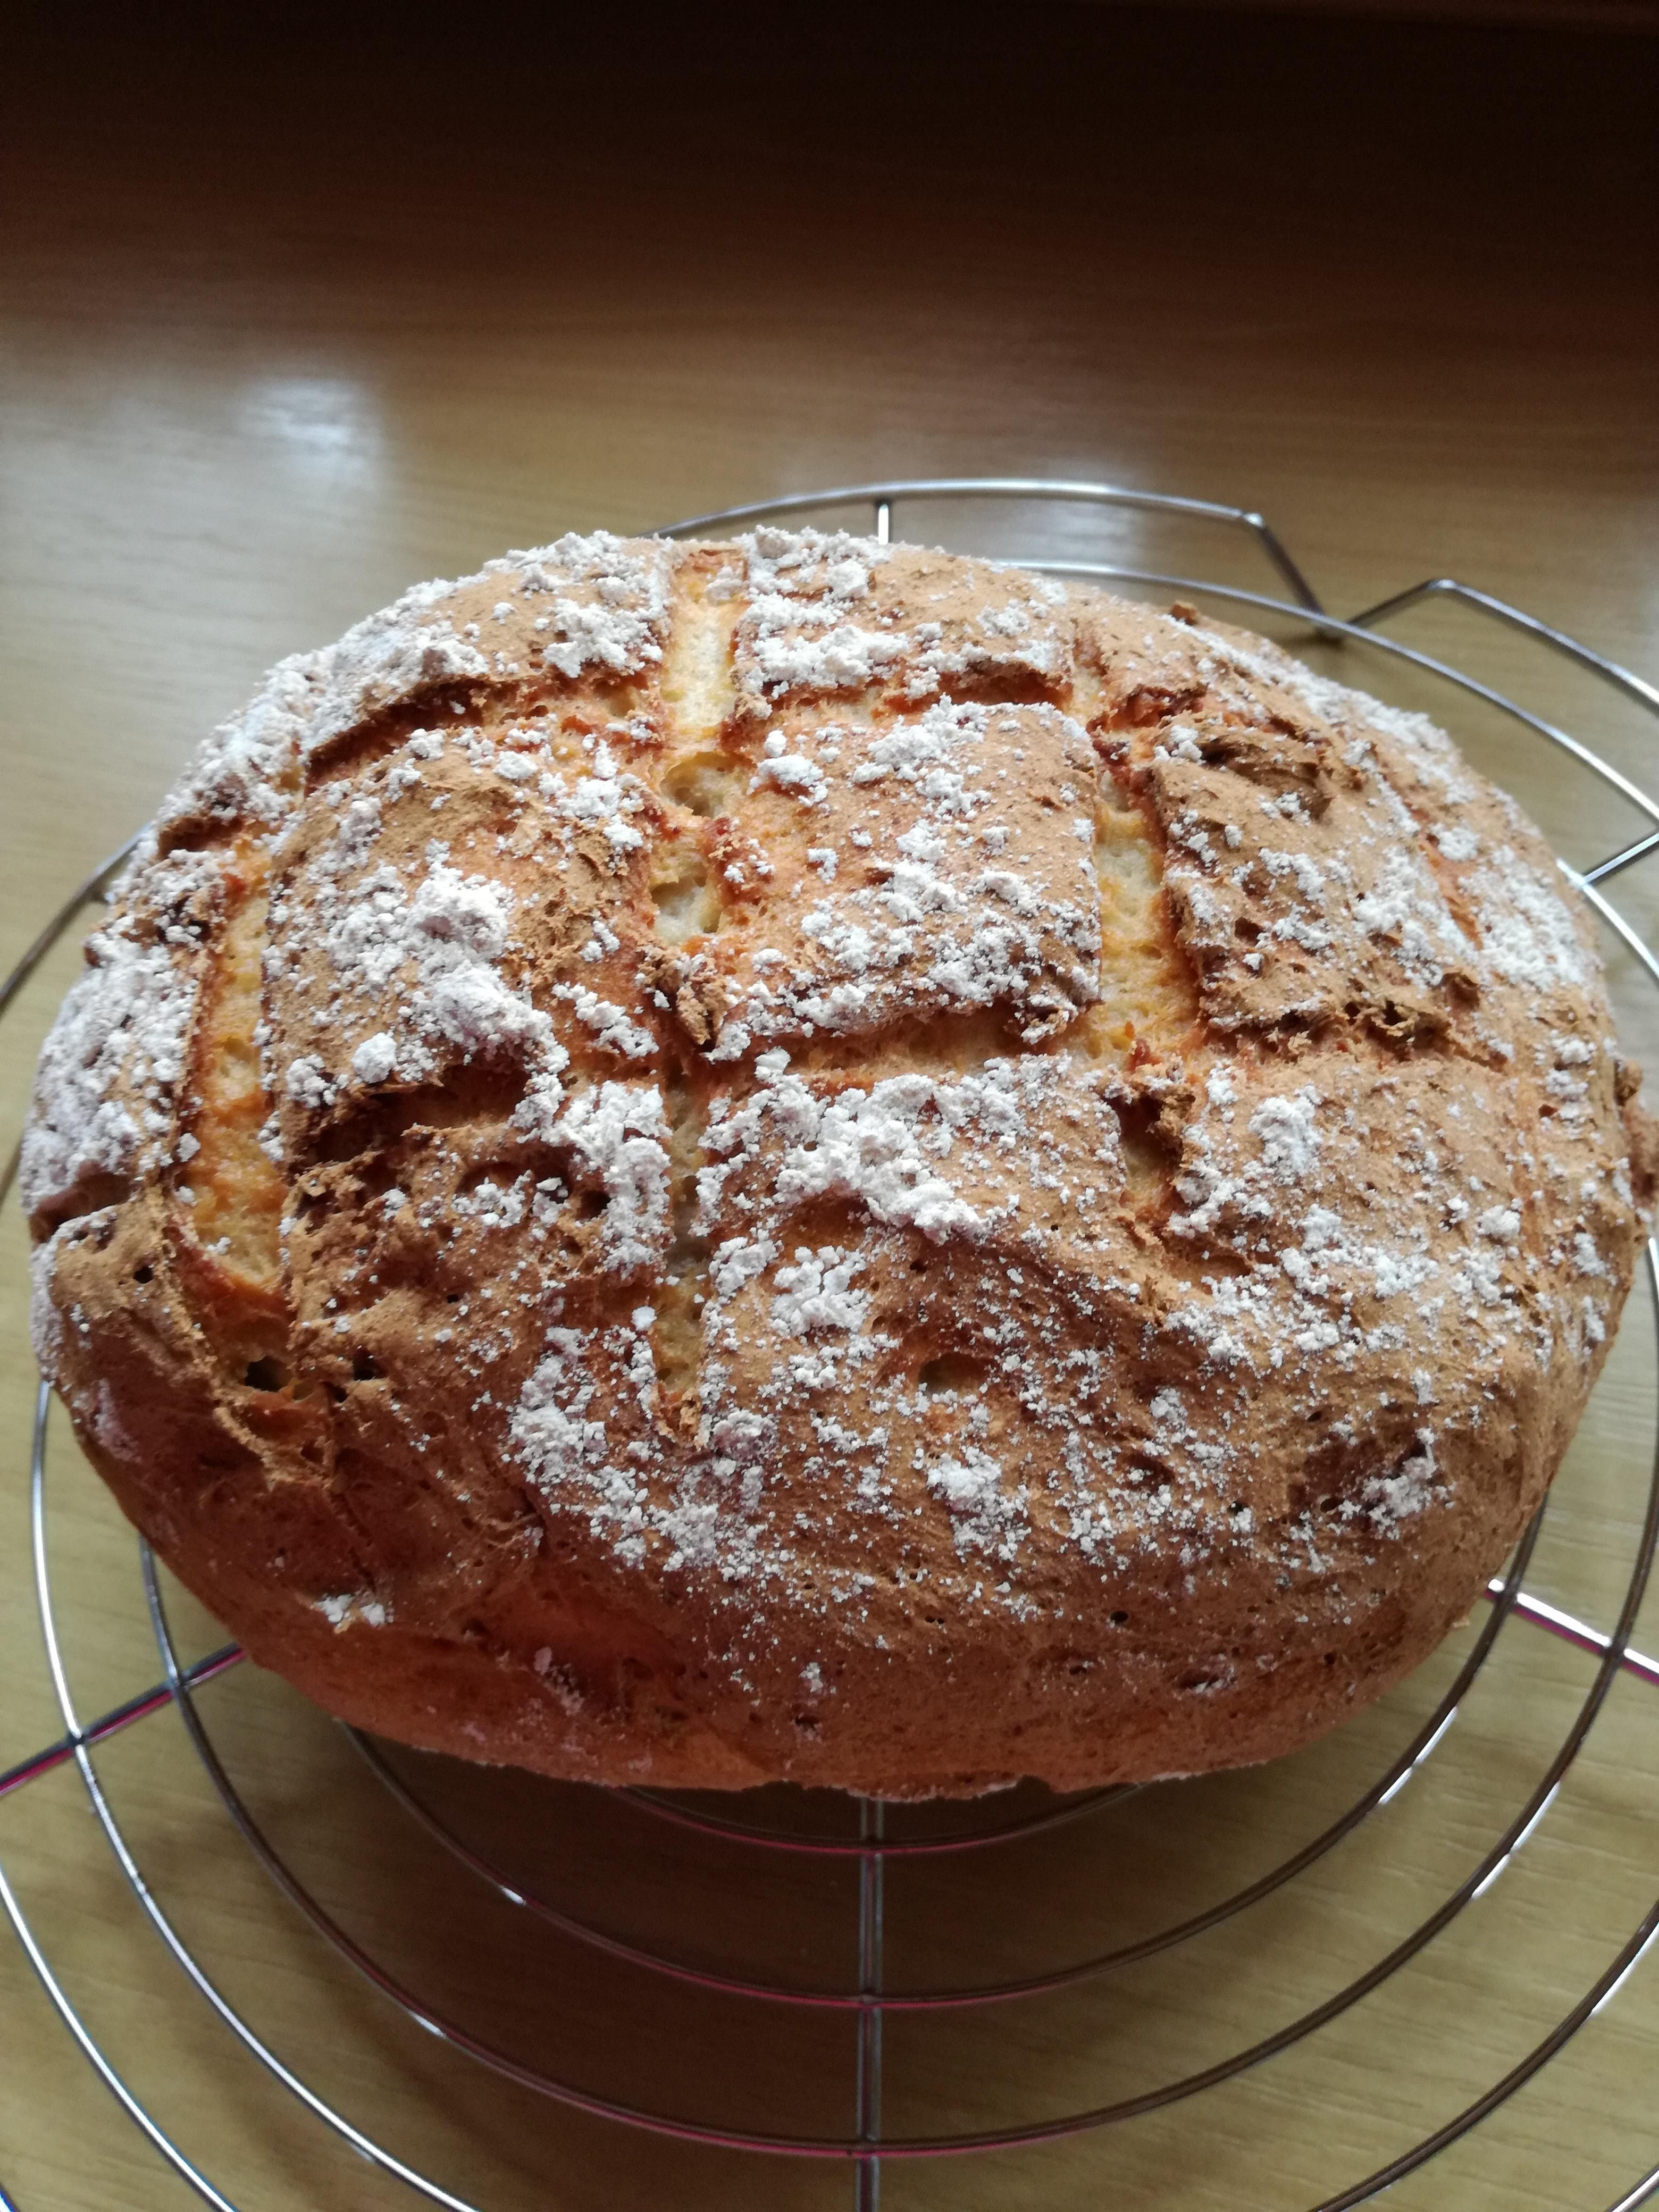 Buttermilchbrot Glutenfrei Rezept Glutenfreie Lebensmittel Glutenfreies Brot Backen Glutenfrei